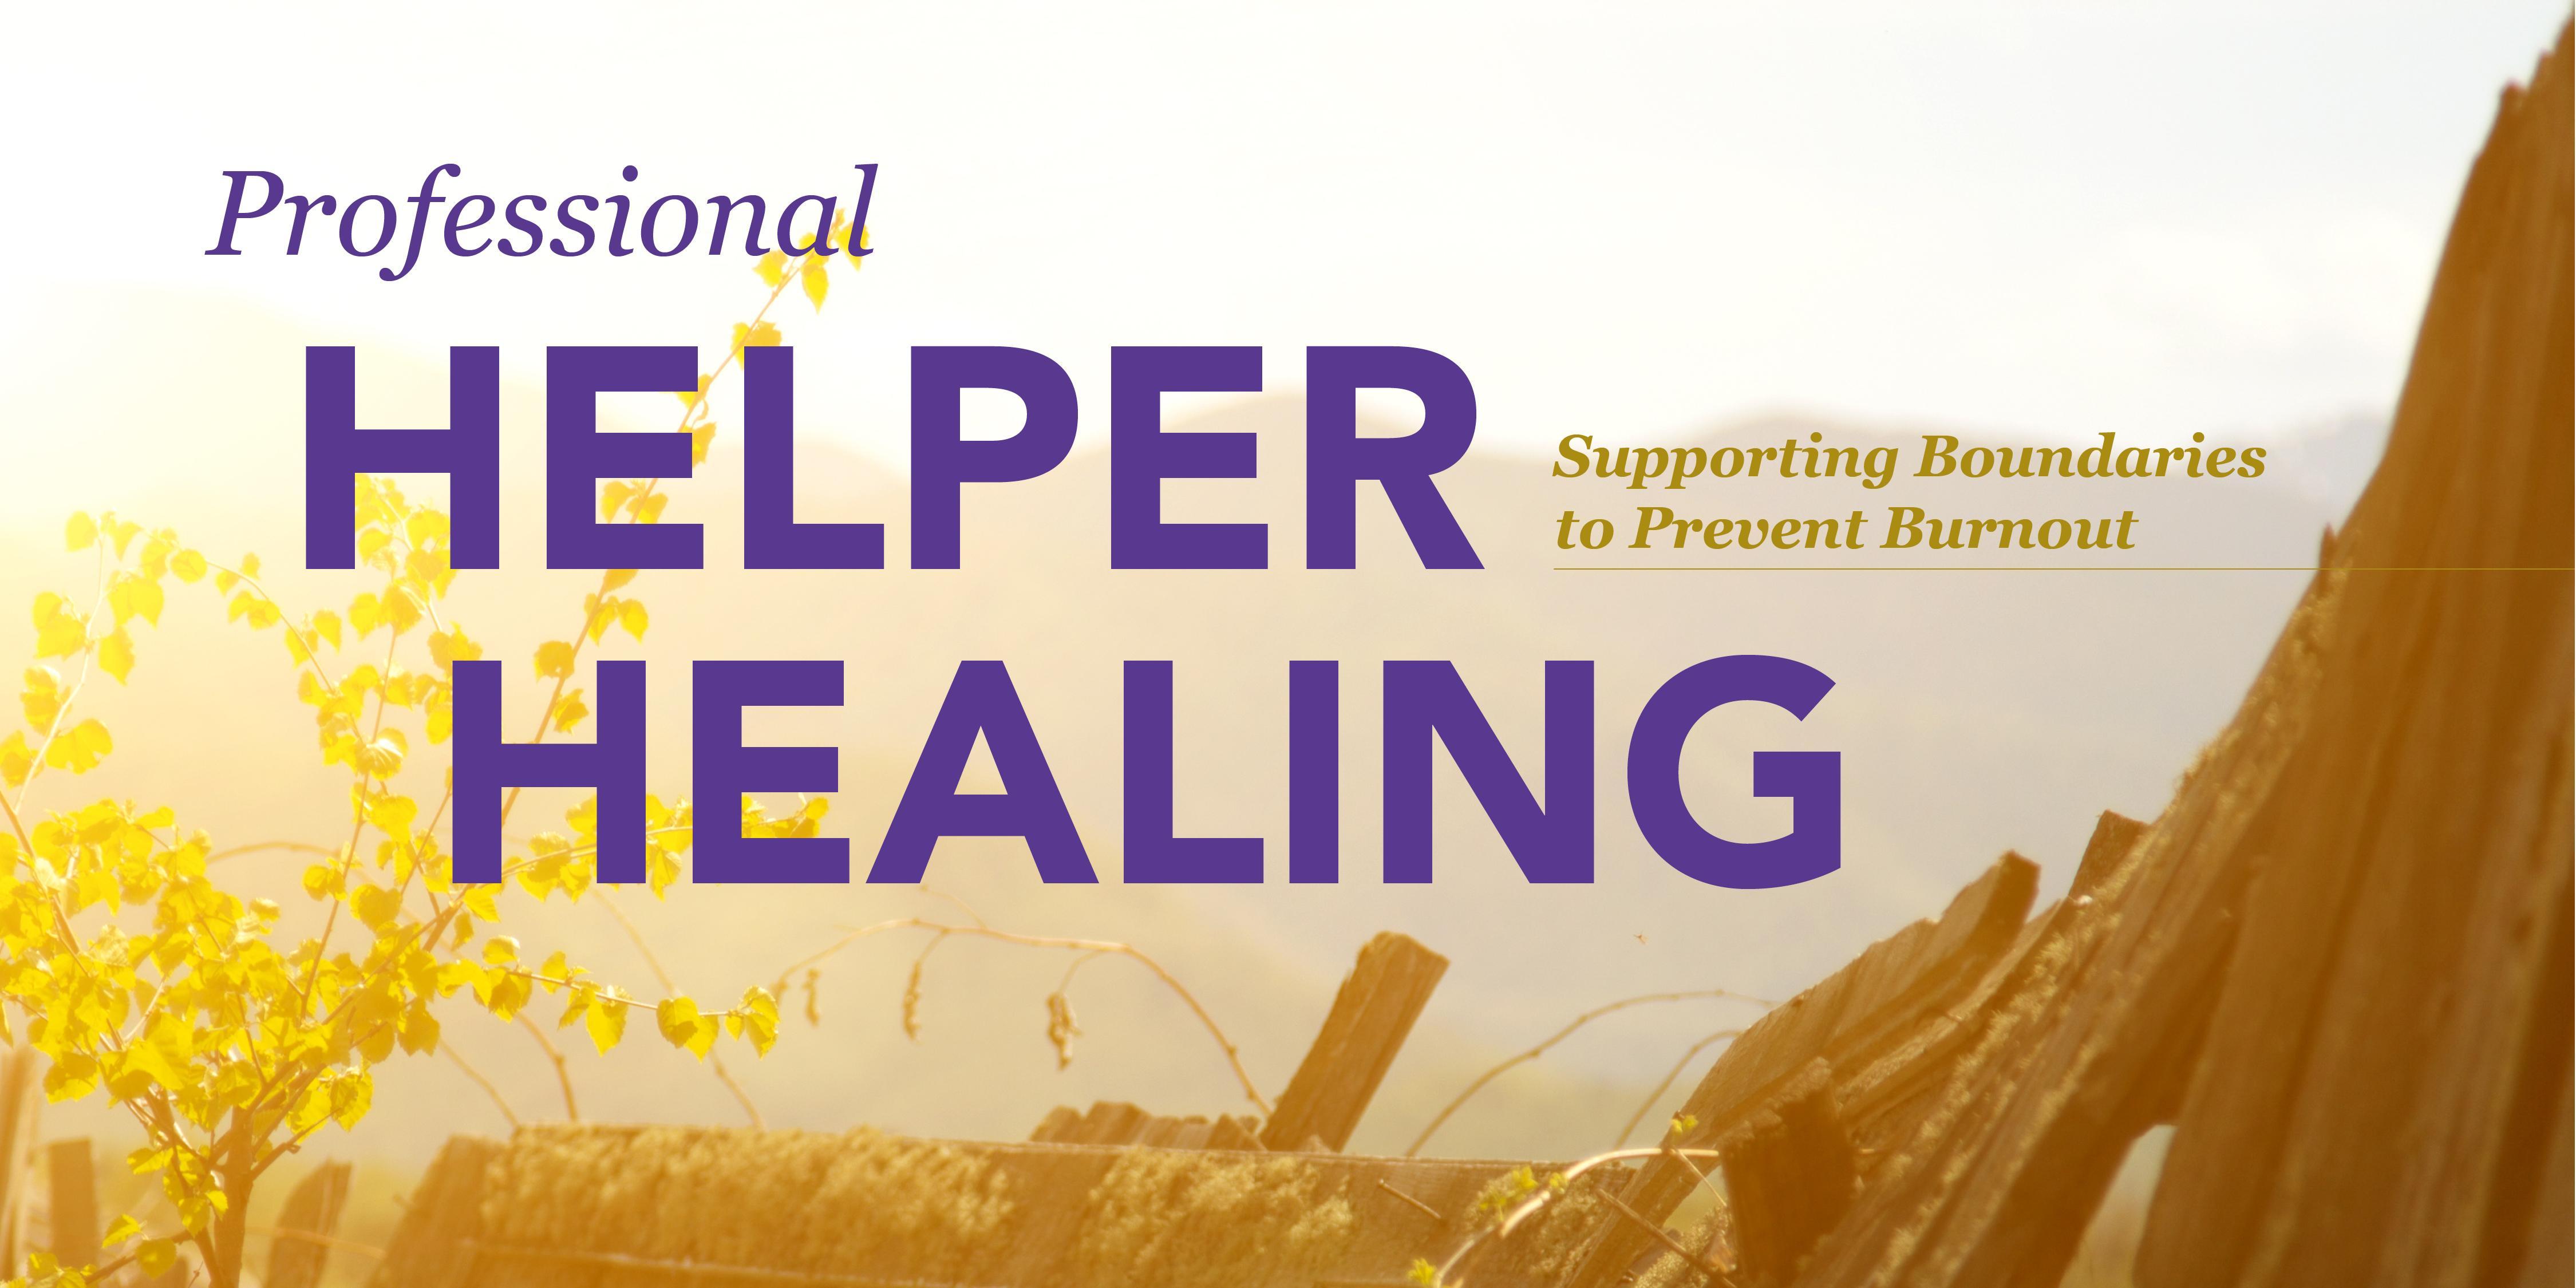 Professional Helper Healing